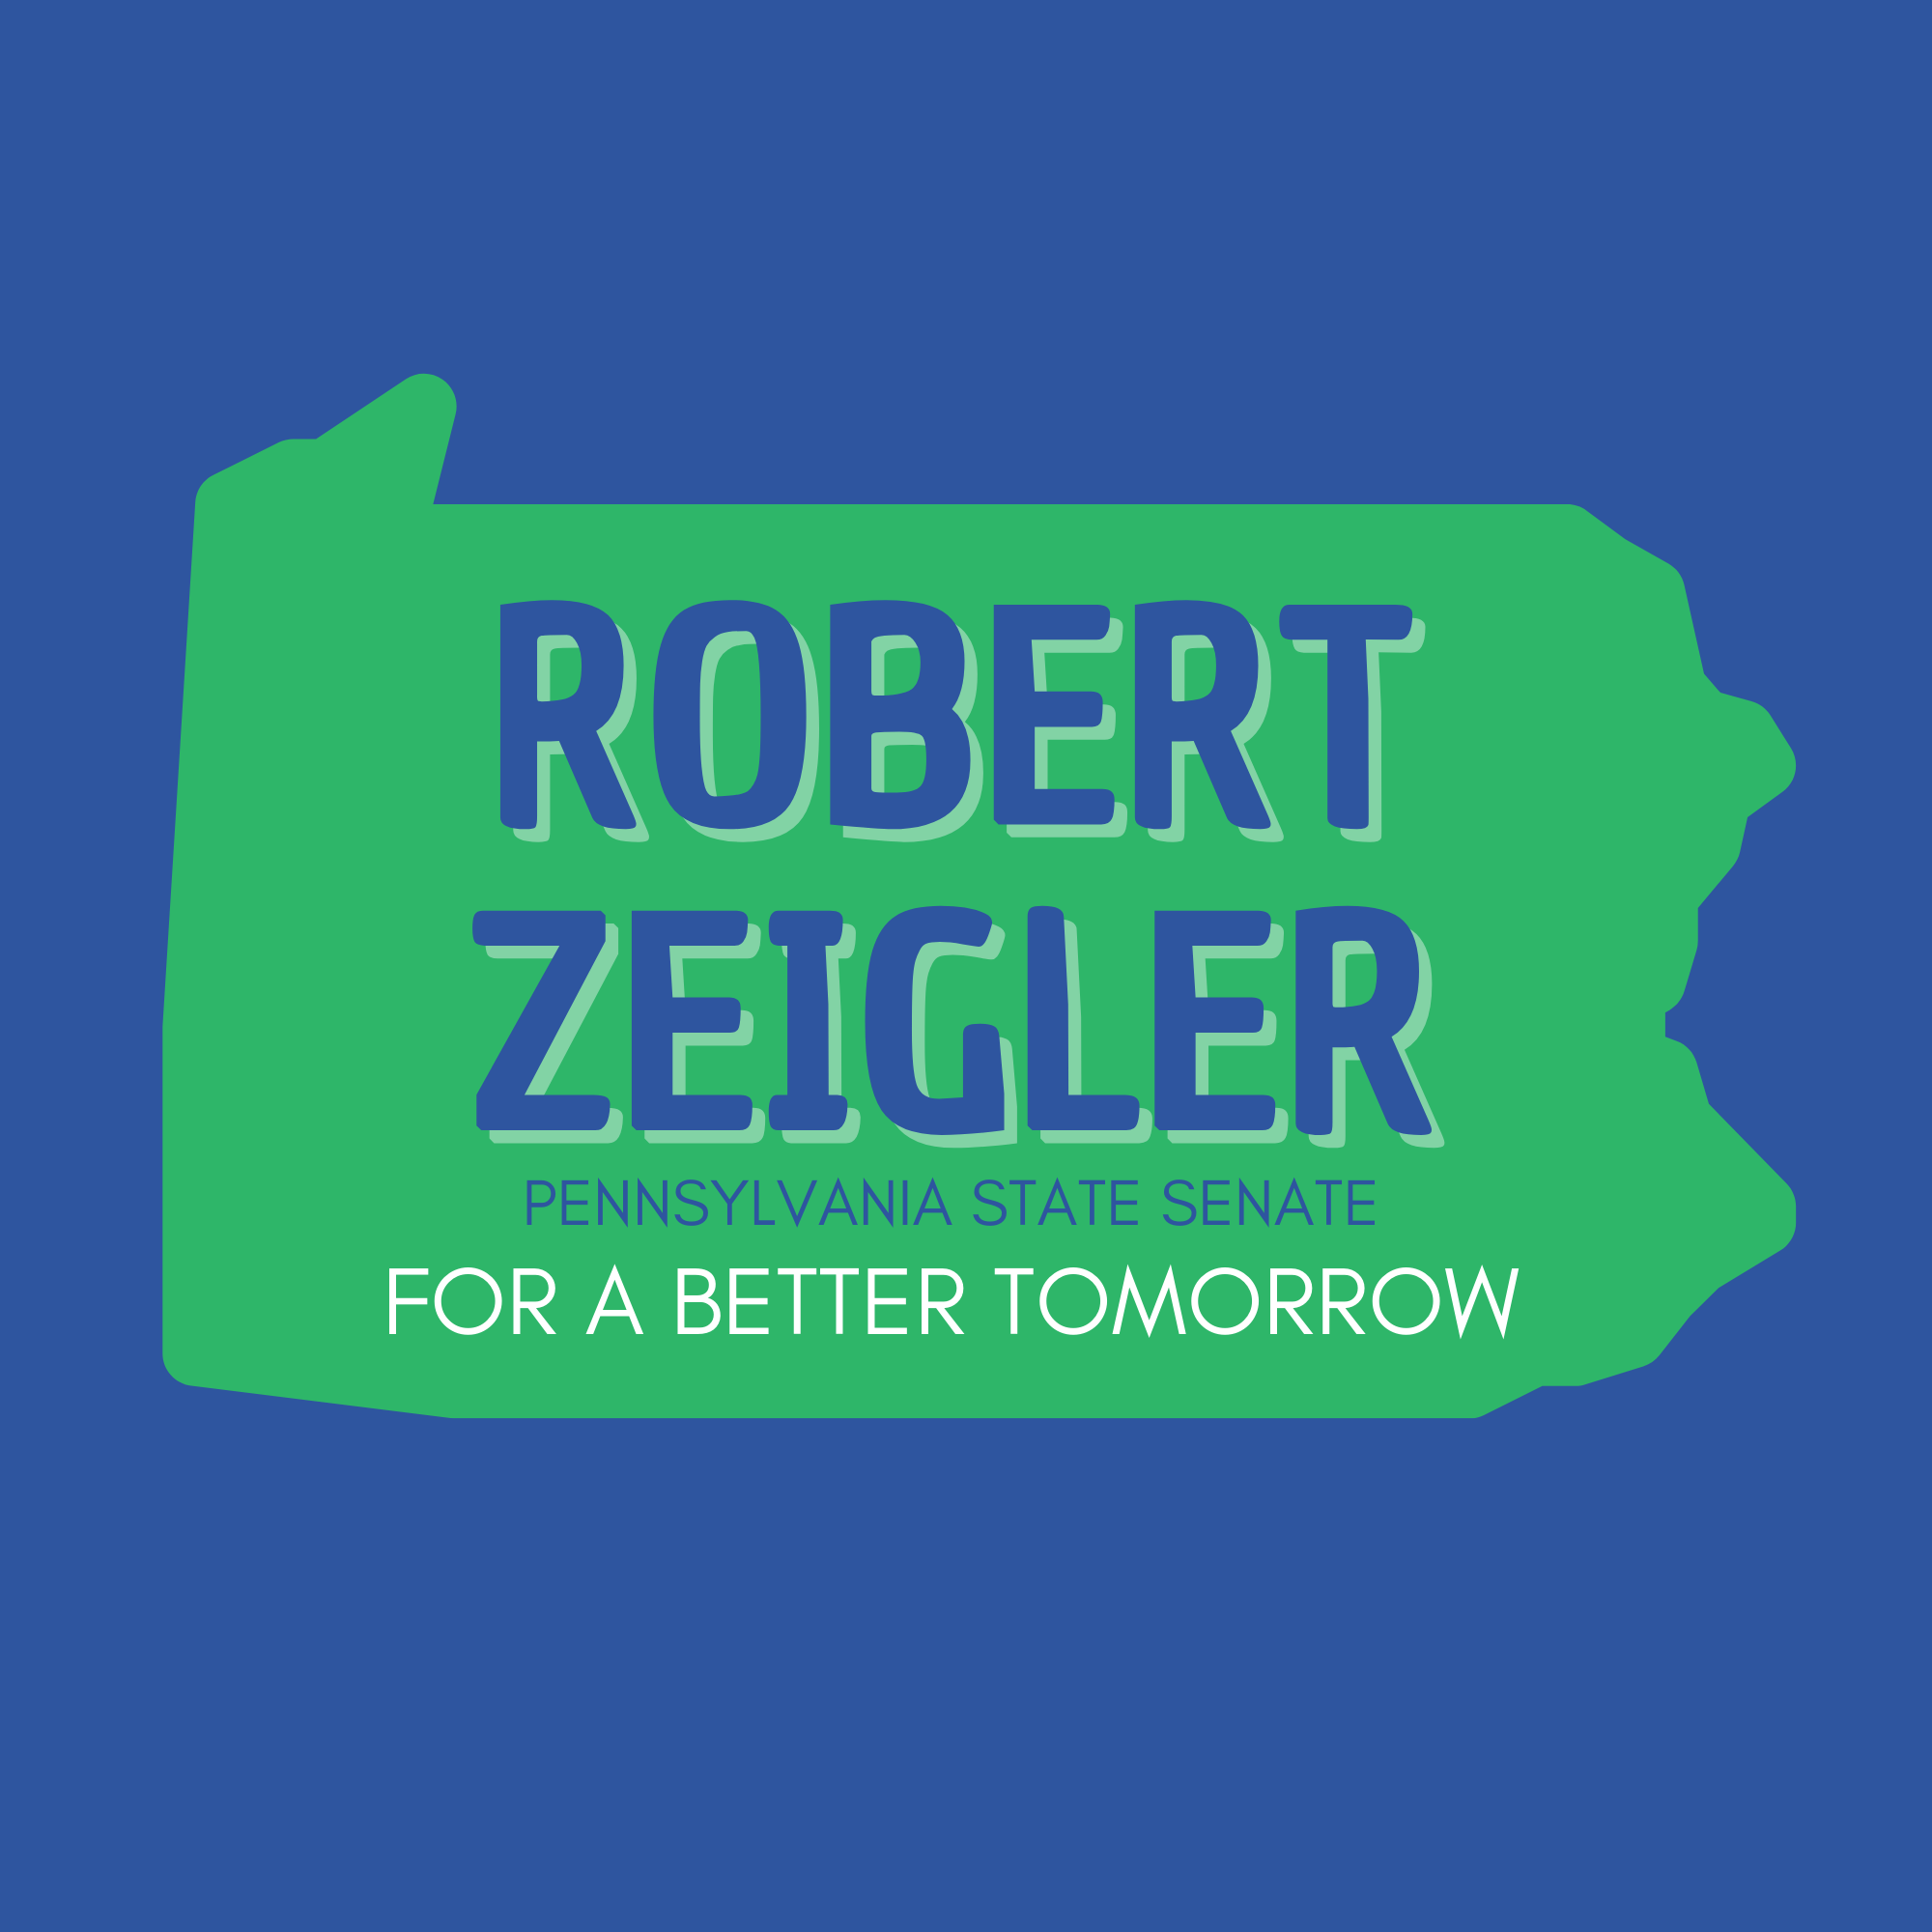 Robert Zeigler for PA Senate